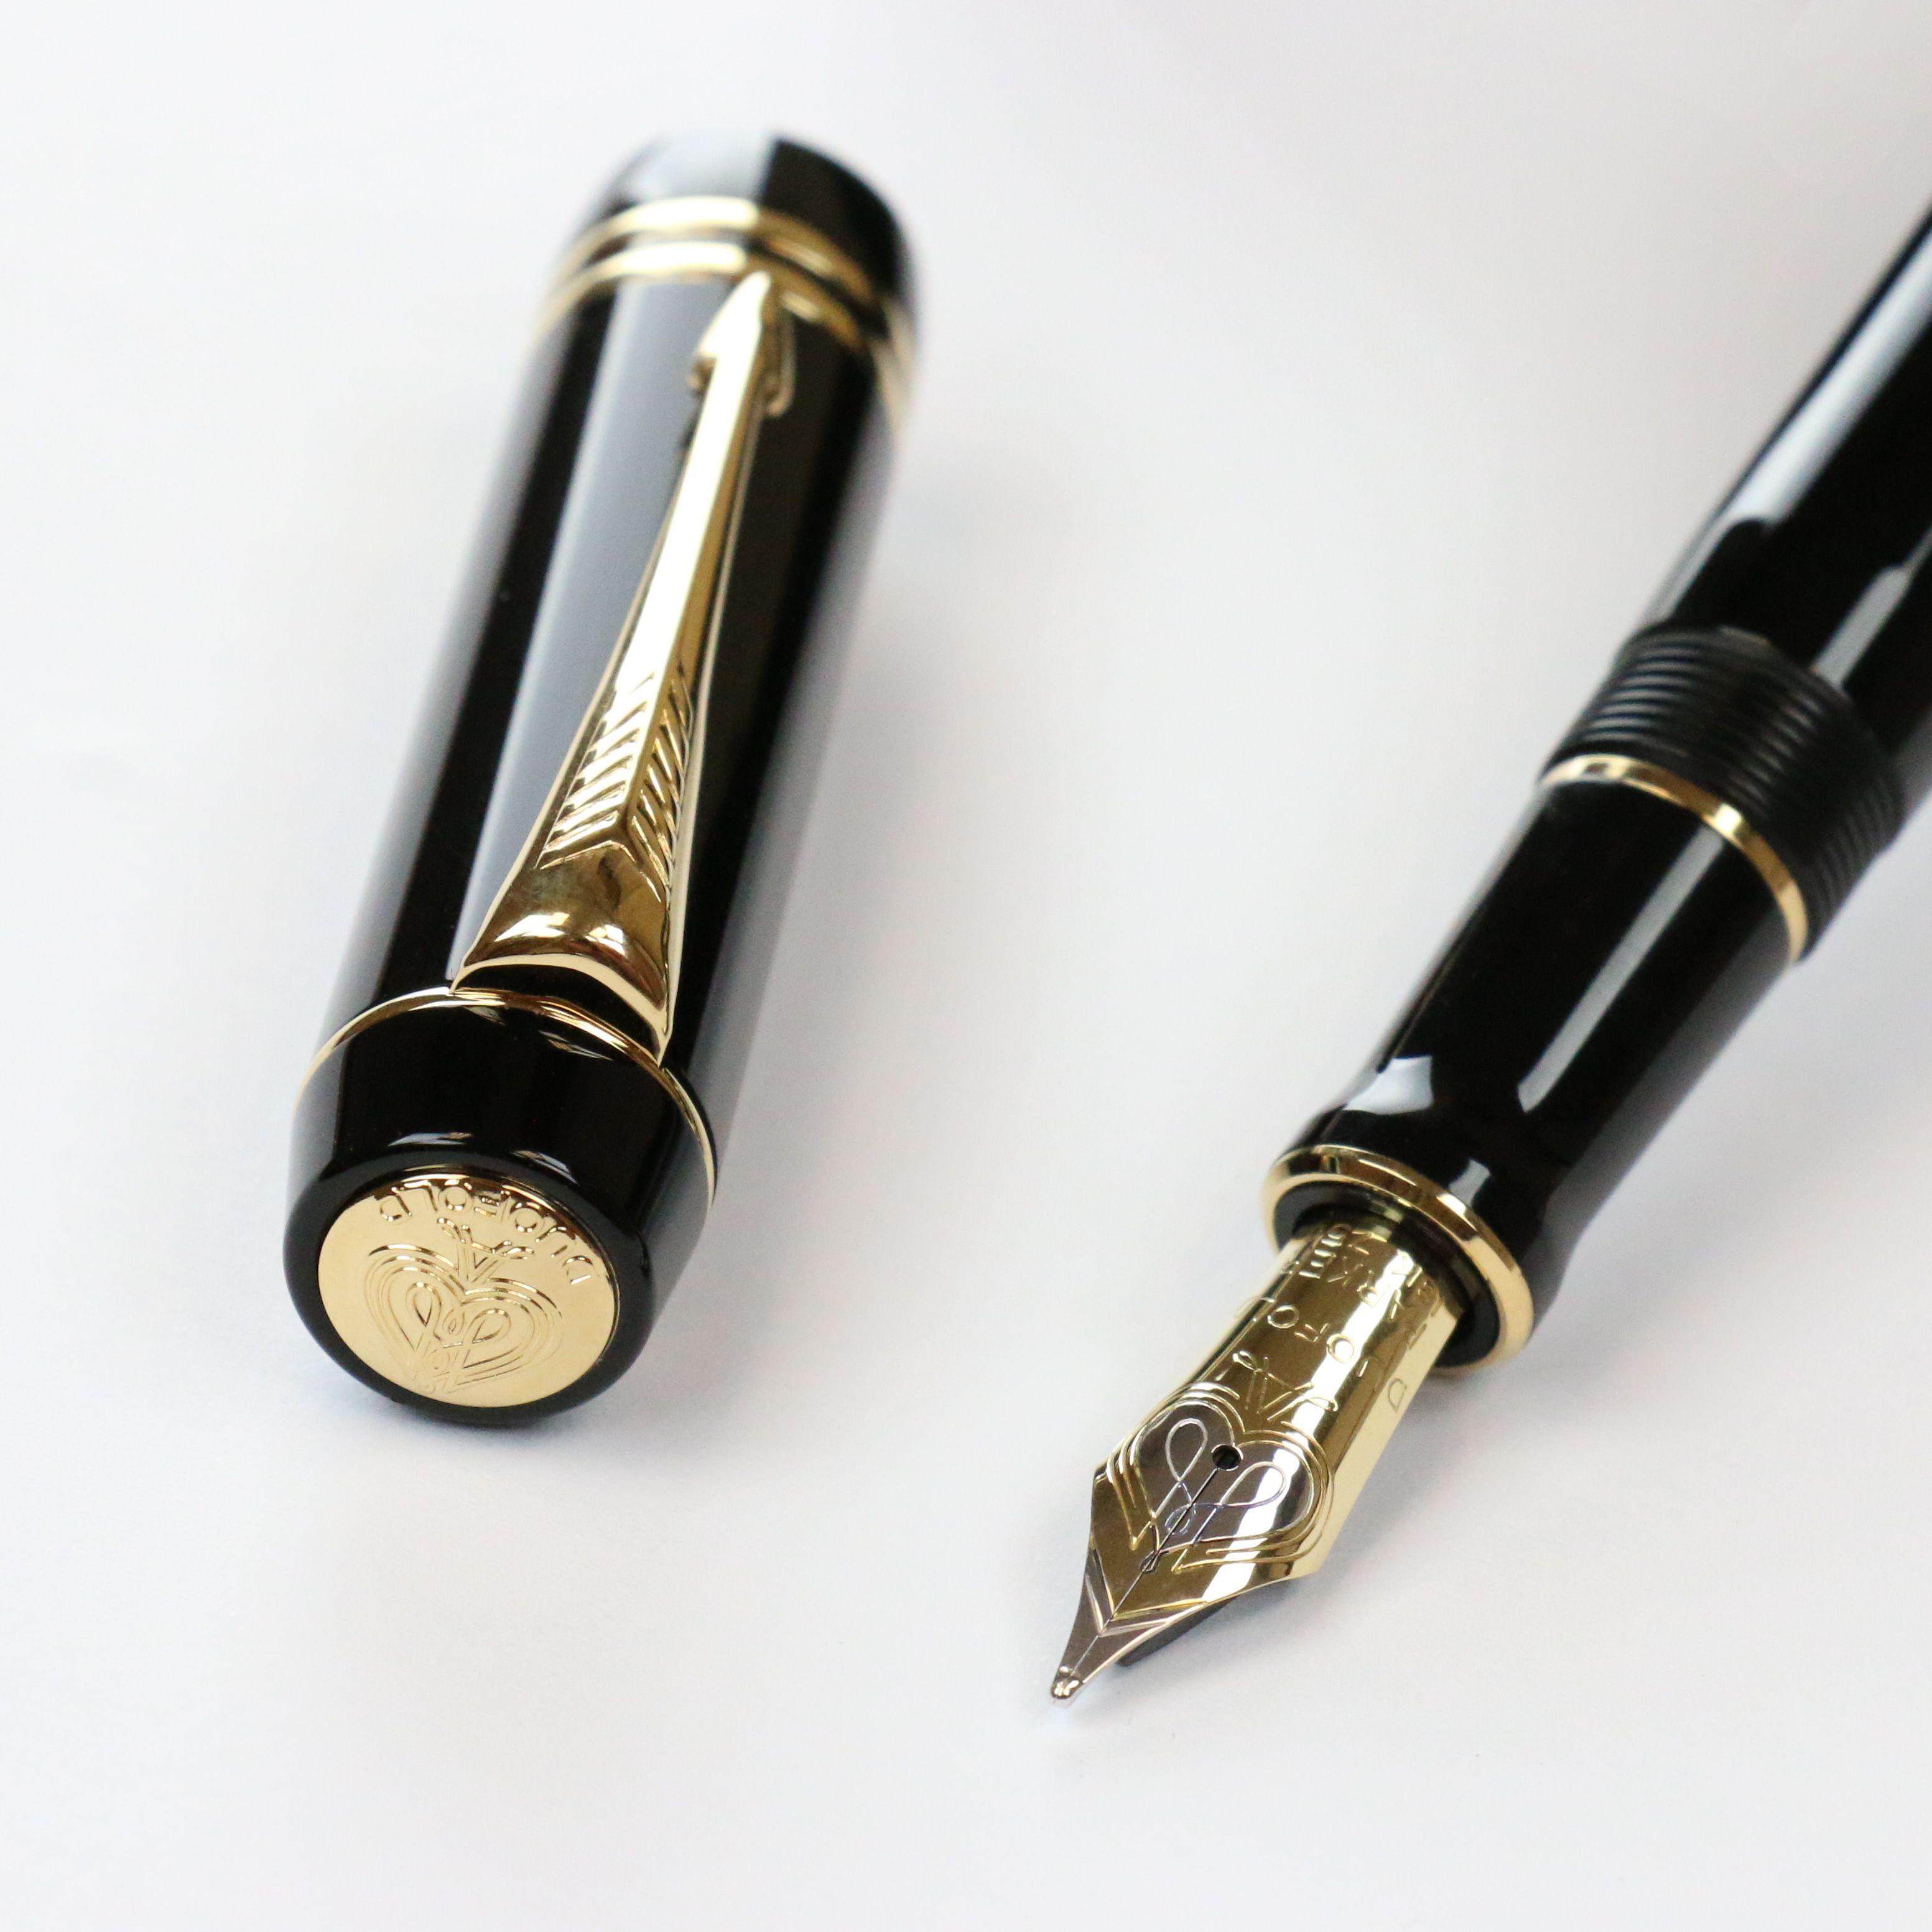 Parker Duofold Centennial Fountain Pens   Fountain pen